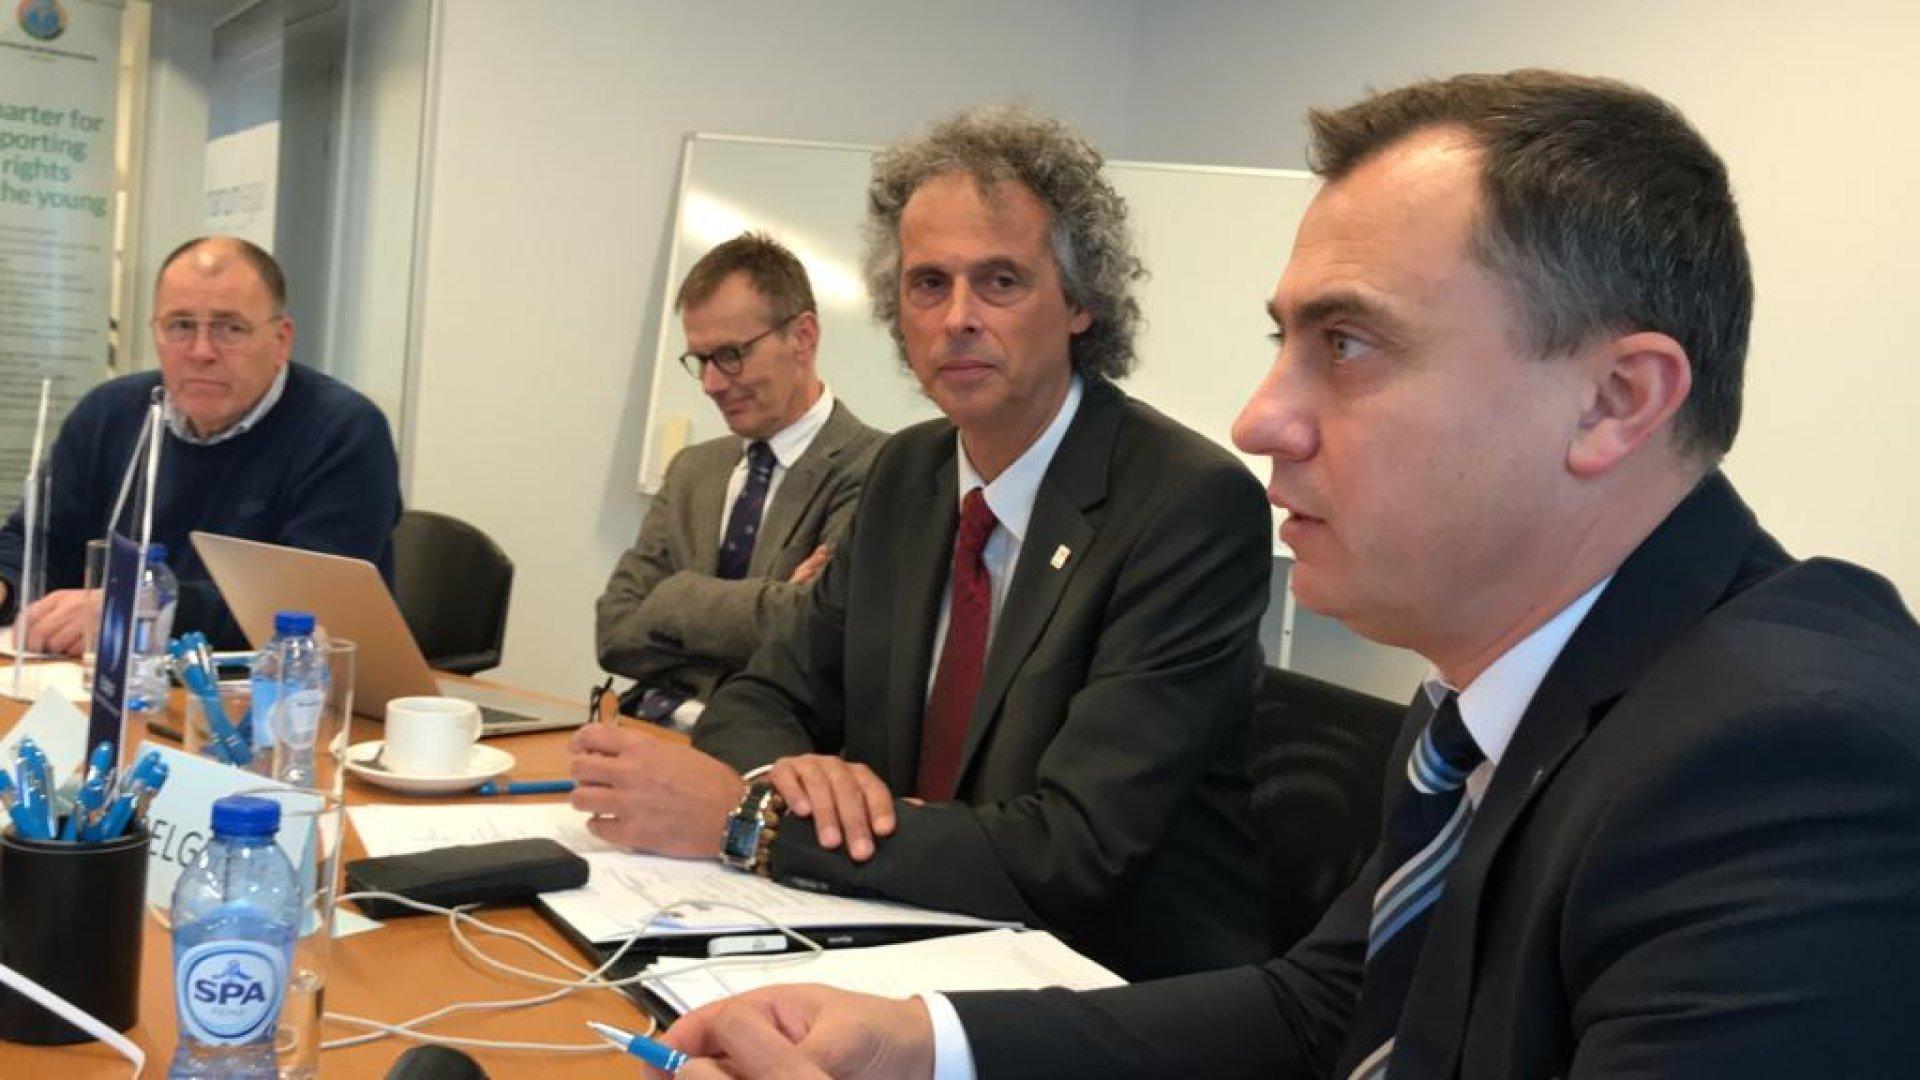 Стефан Колев (на преден план вдясно) бе избран за вицепрезидент